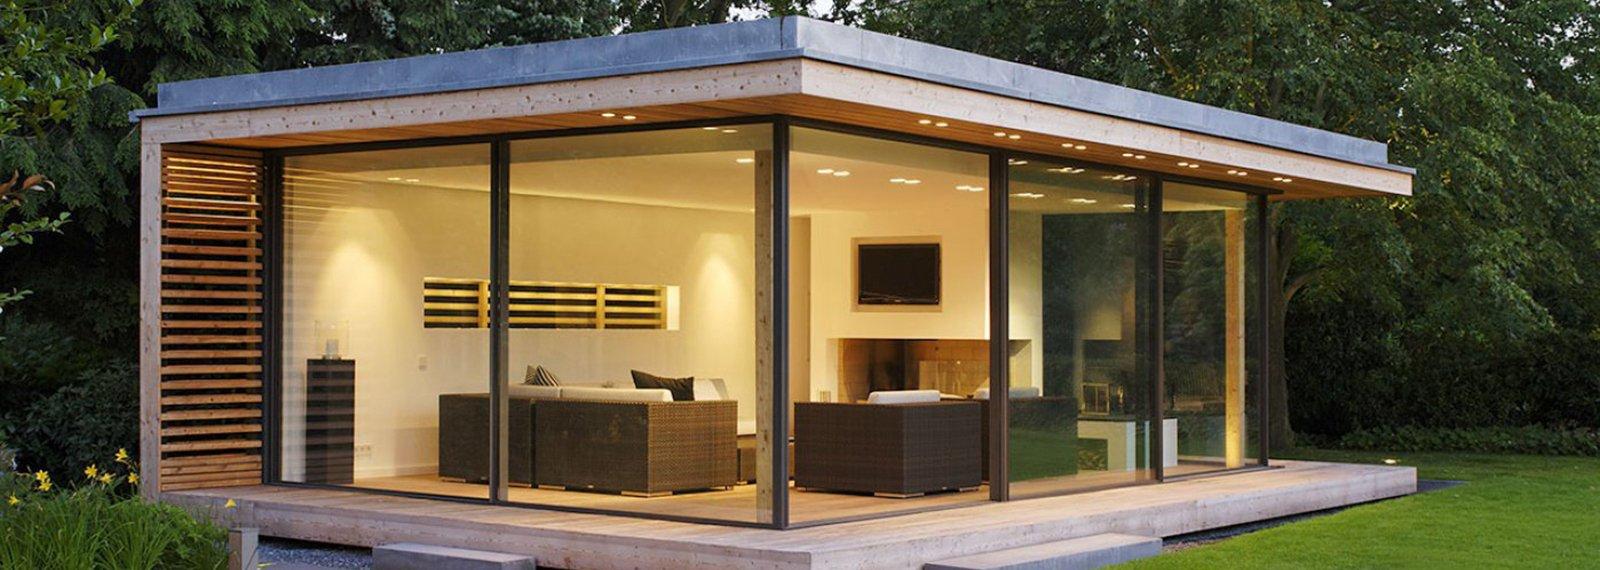 Studio De Jardin Bois Habitable Pool House Extension Maison tout Studio De Jardin Habitable